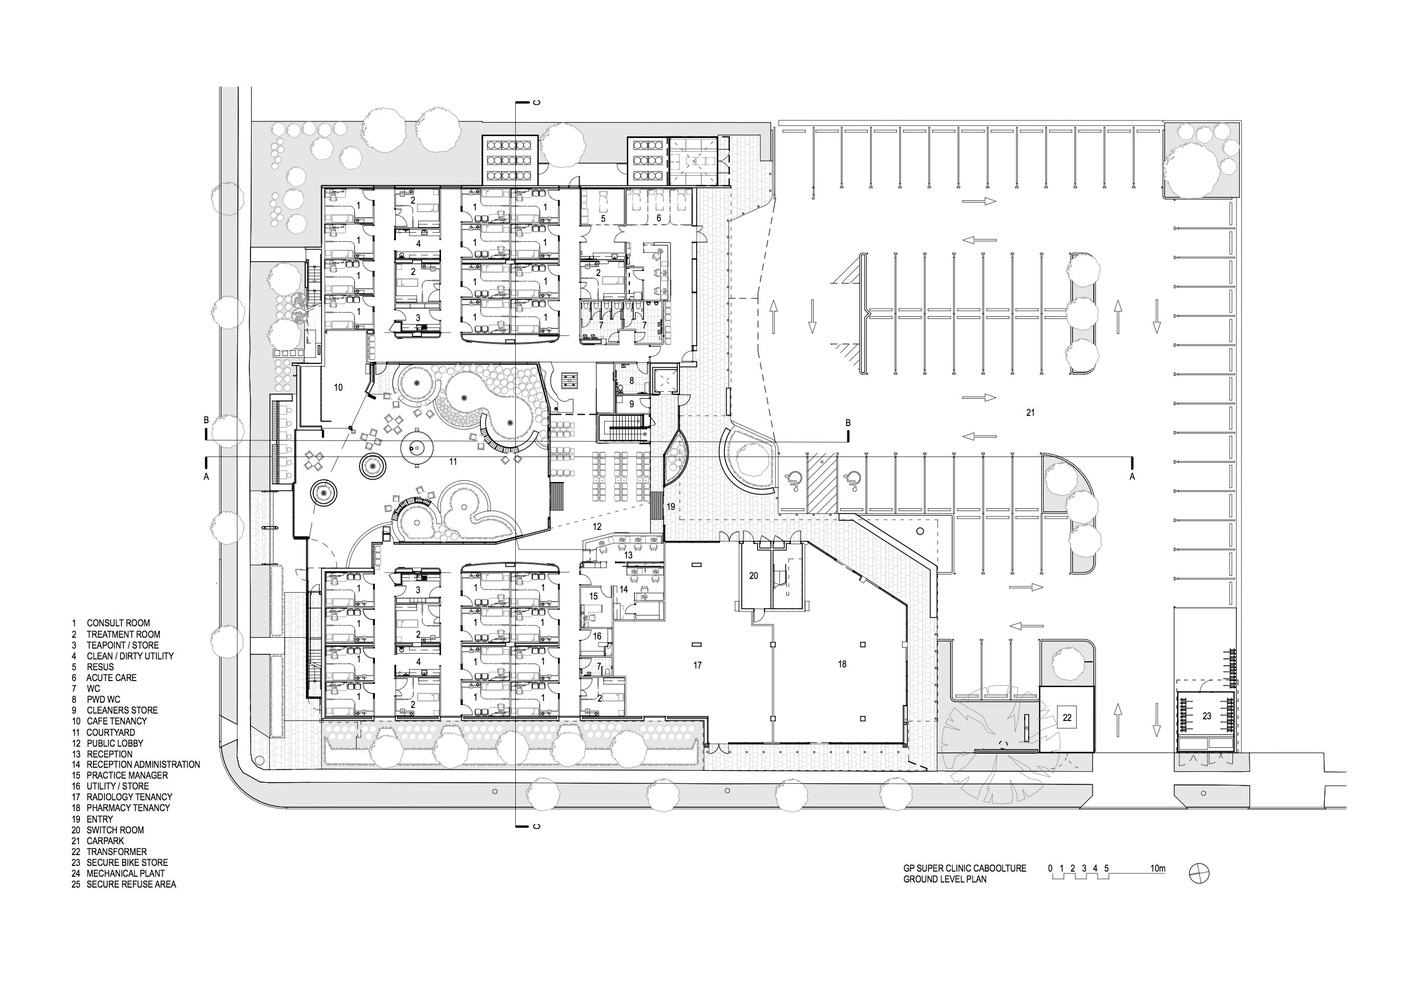 caboolture gp super clinic ground floor plan [ 1415 x 1000 Pixel ]